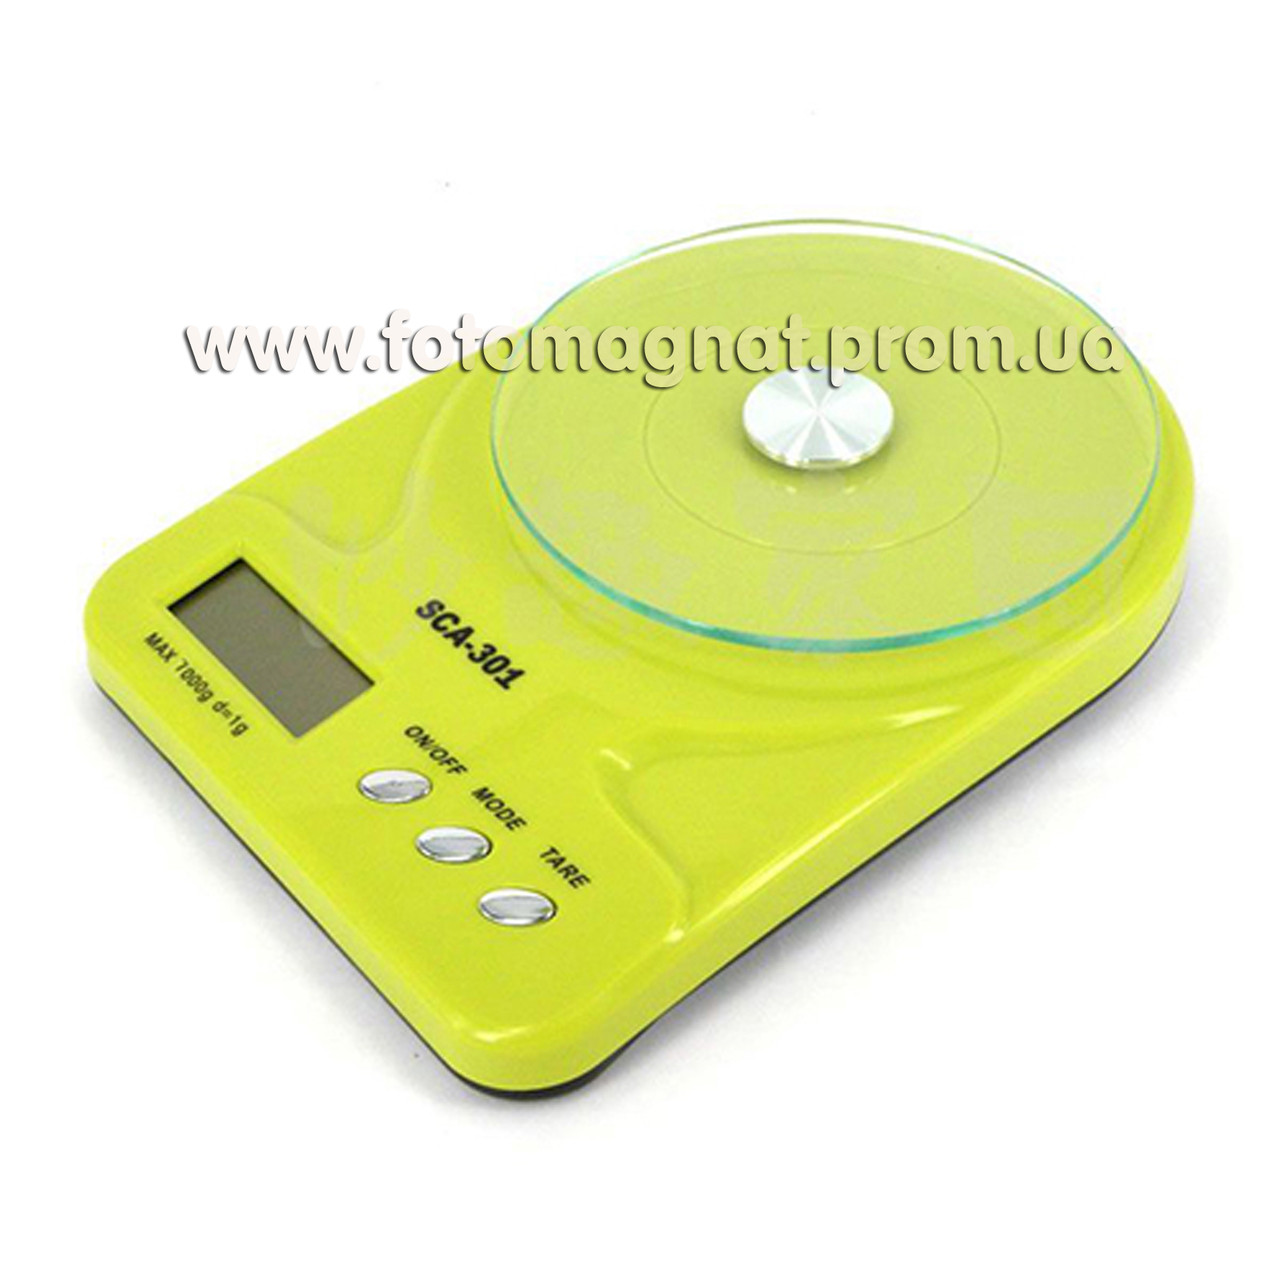 Весы кухонные электронные  NN 102/301/6102 7кг.(электронные весы)